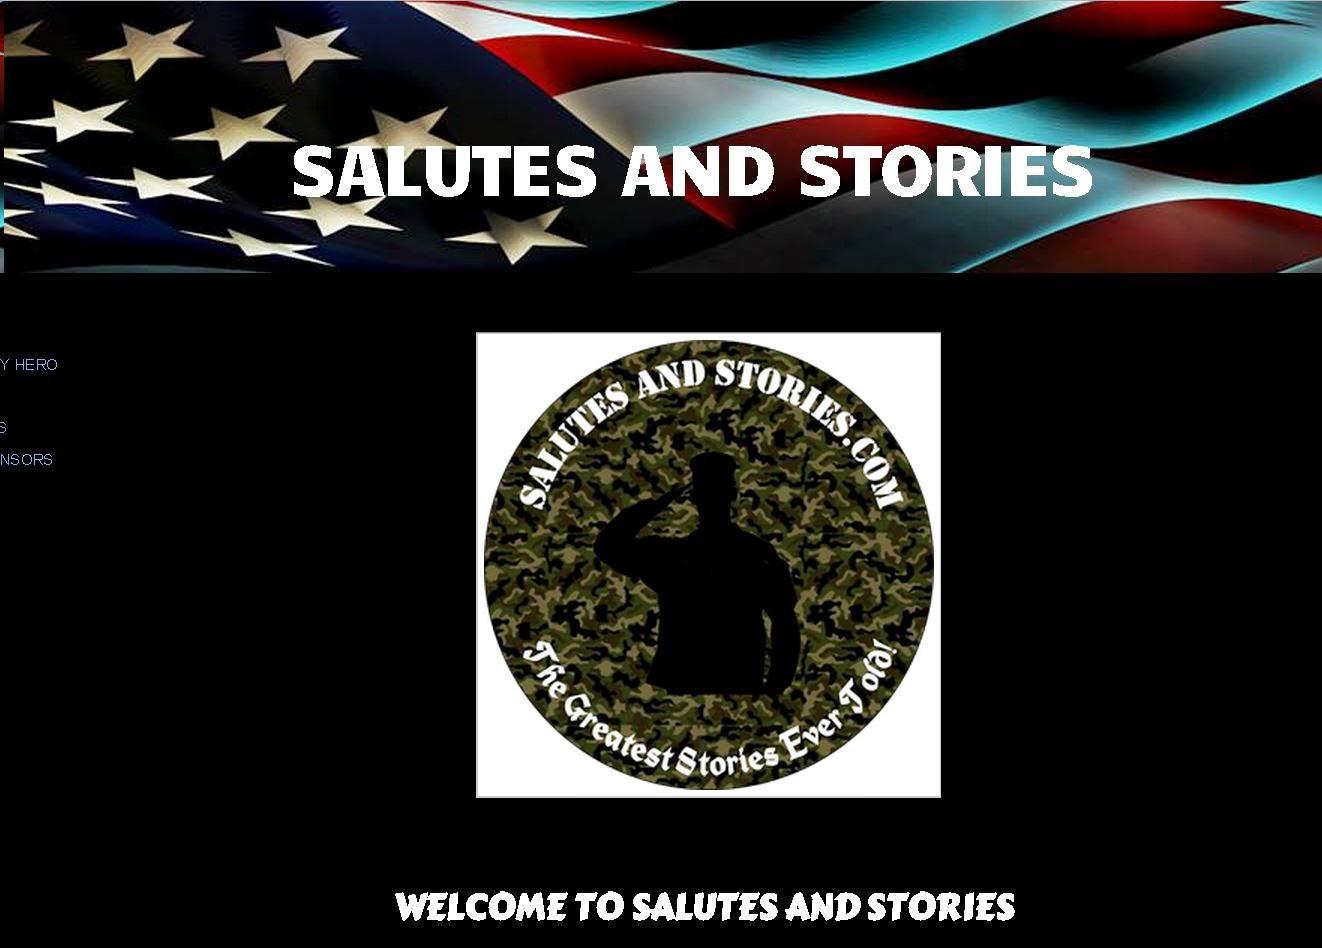 http://www.salutesandstories.com/